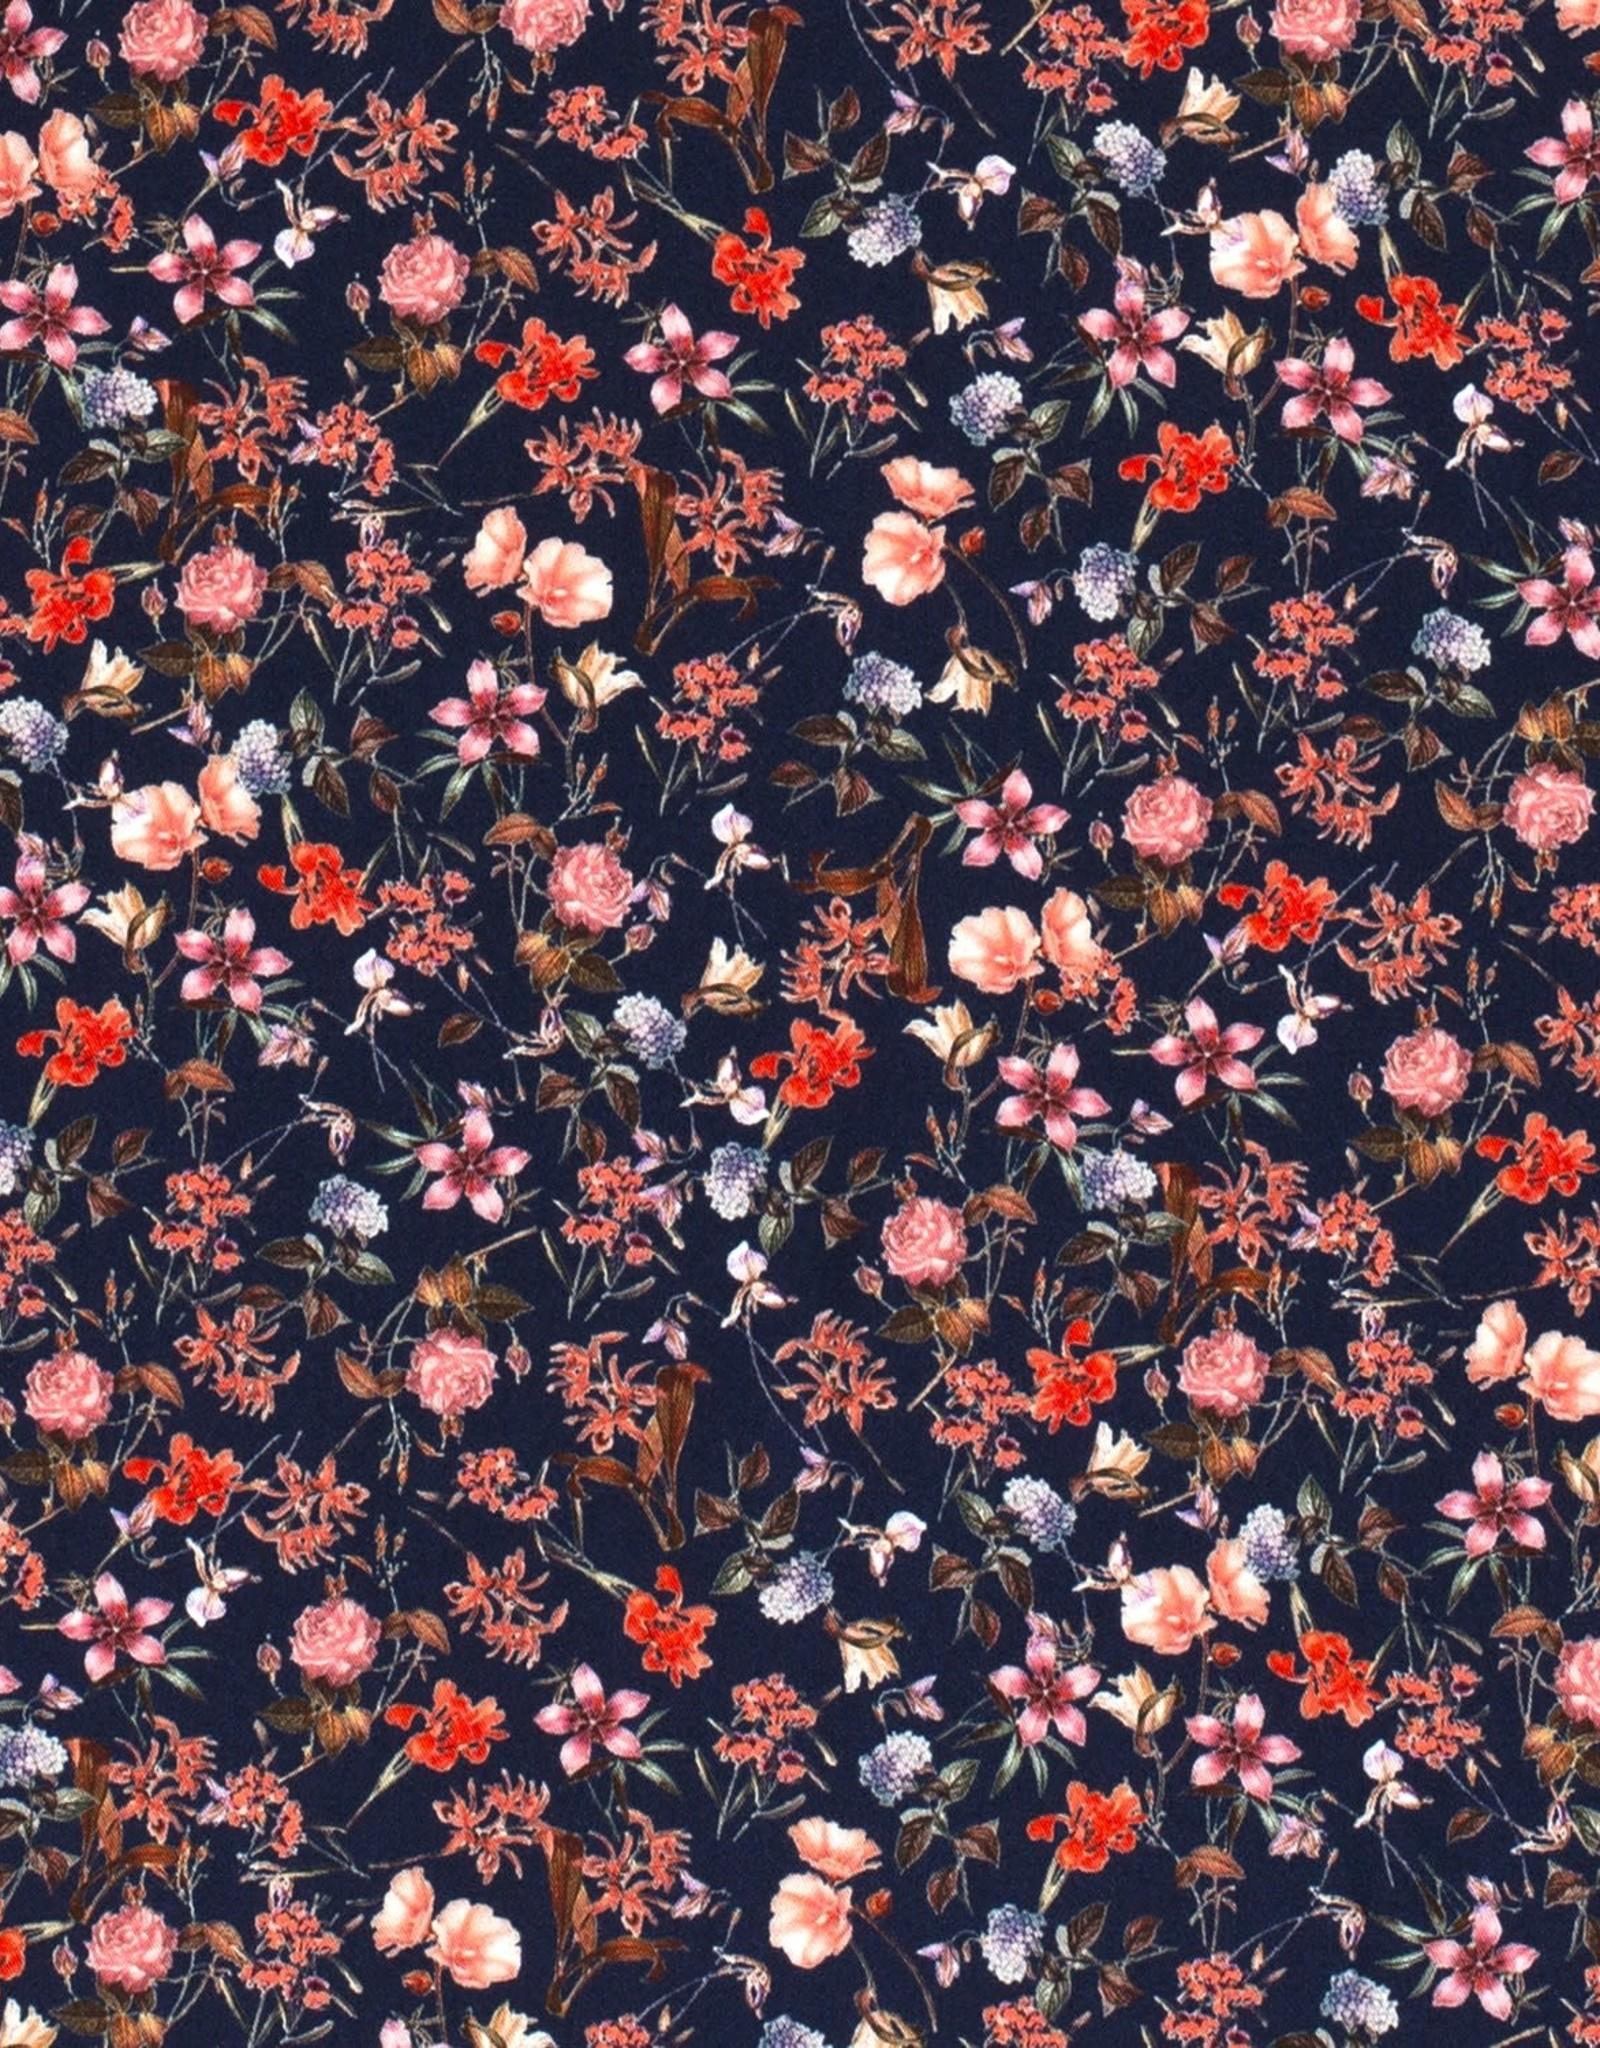 Viscose - Floral Time